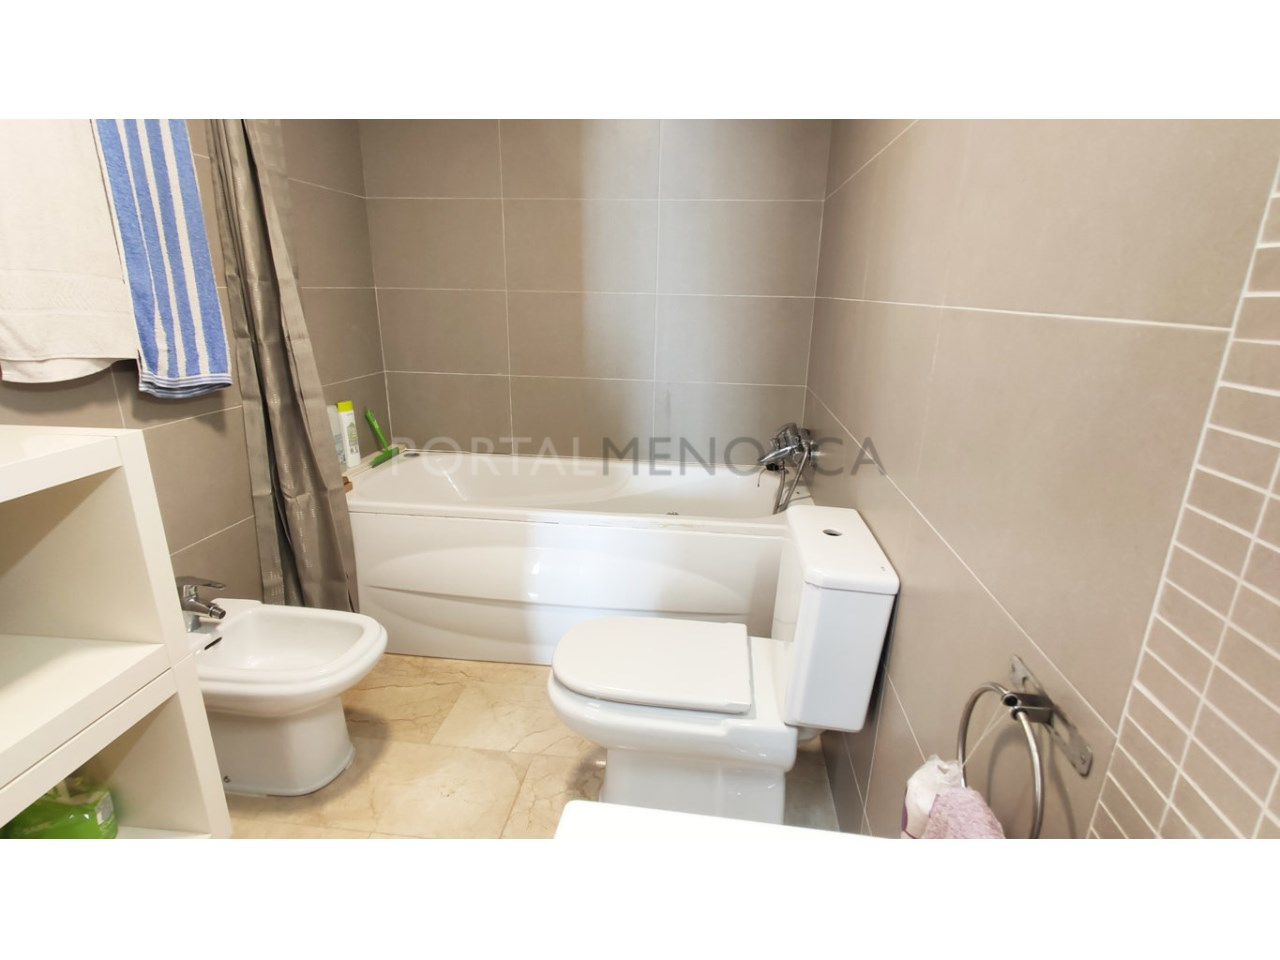 First floor for sale in Ciutadella_Bathroom